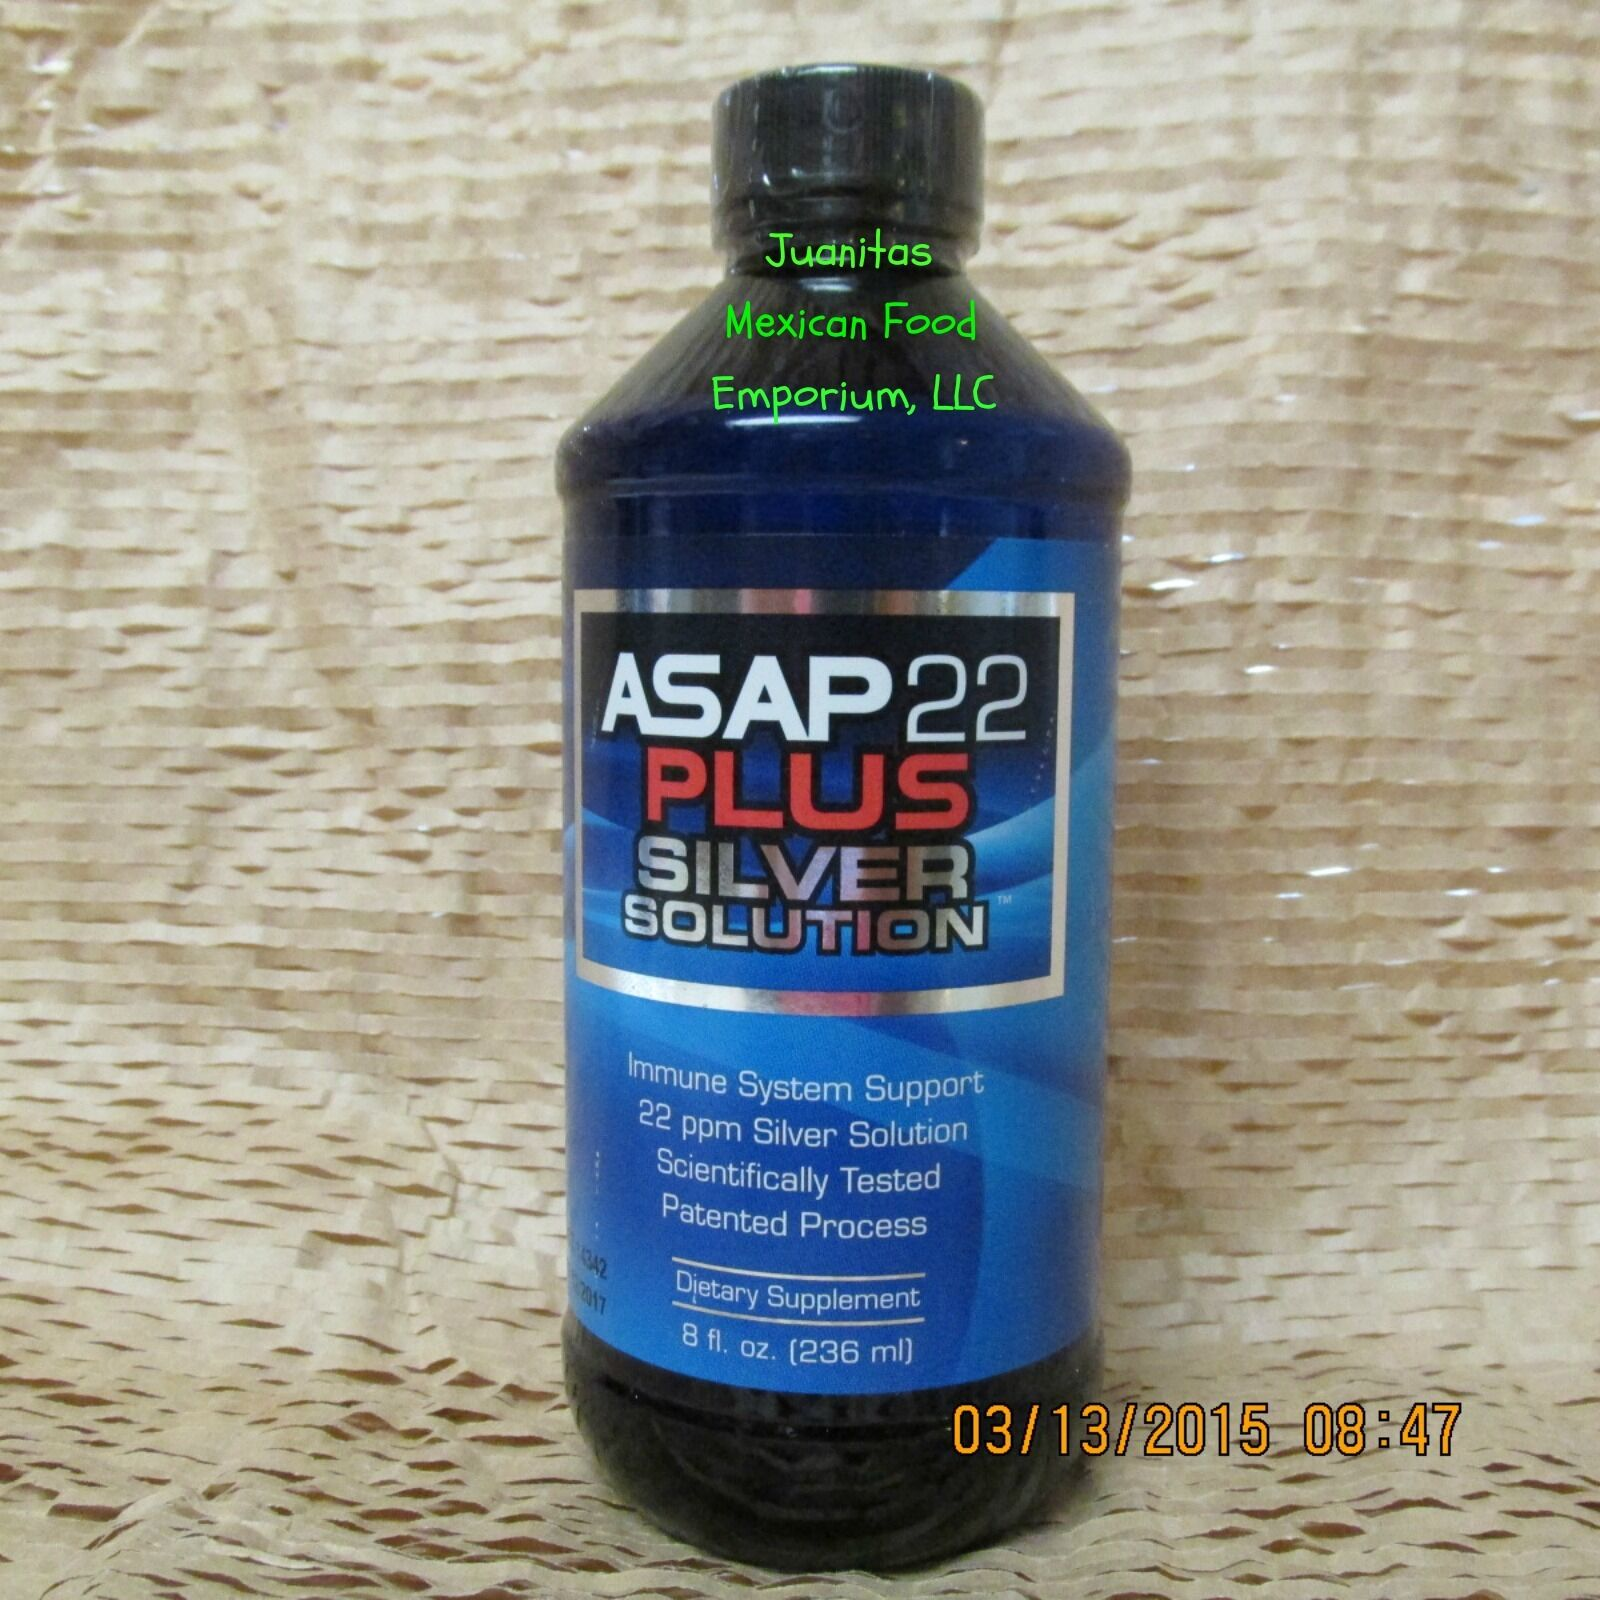 Asap 22 Plus Liquid 22ppm 8 Oz Silver Sol Solution Immune...